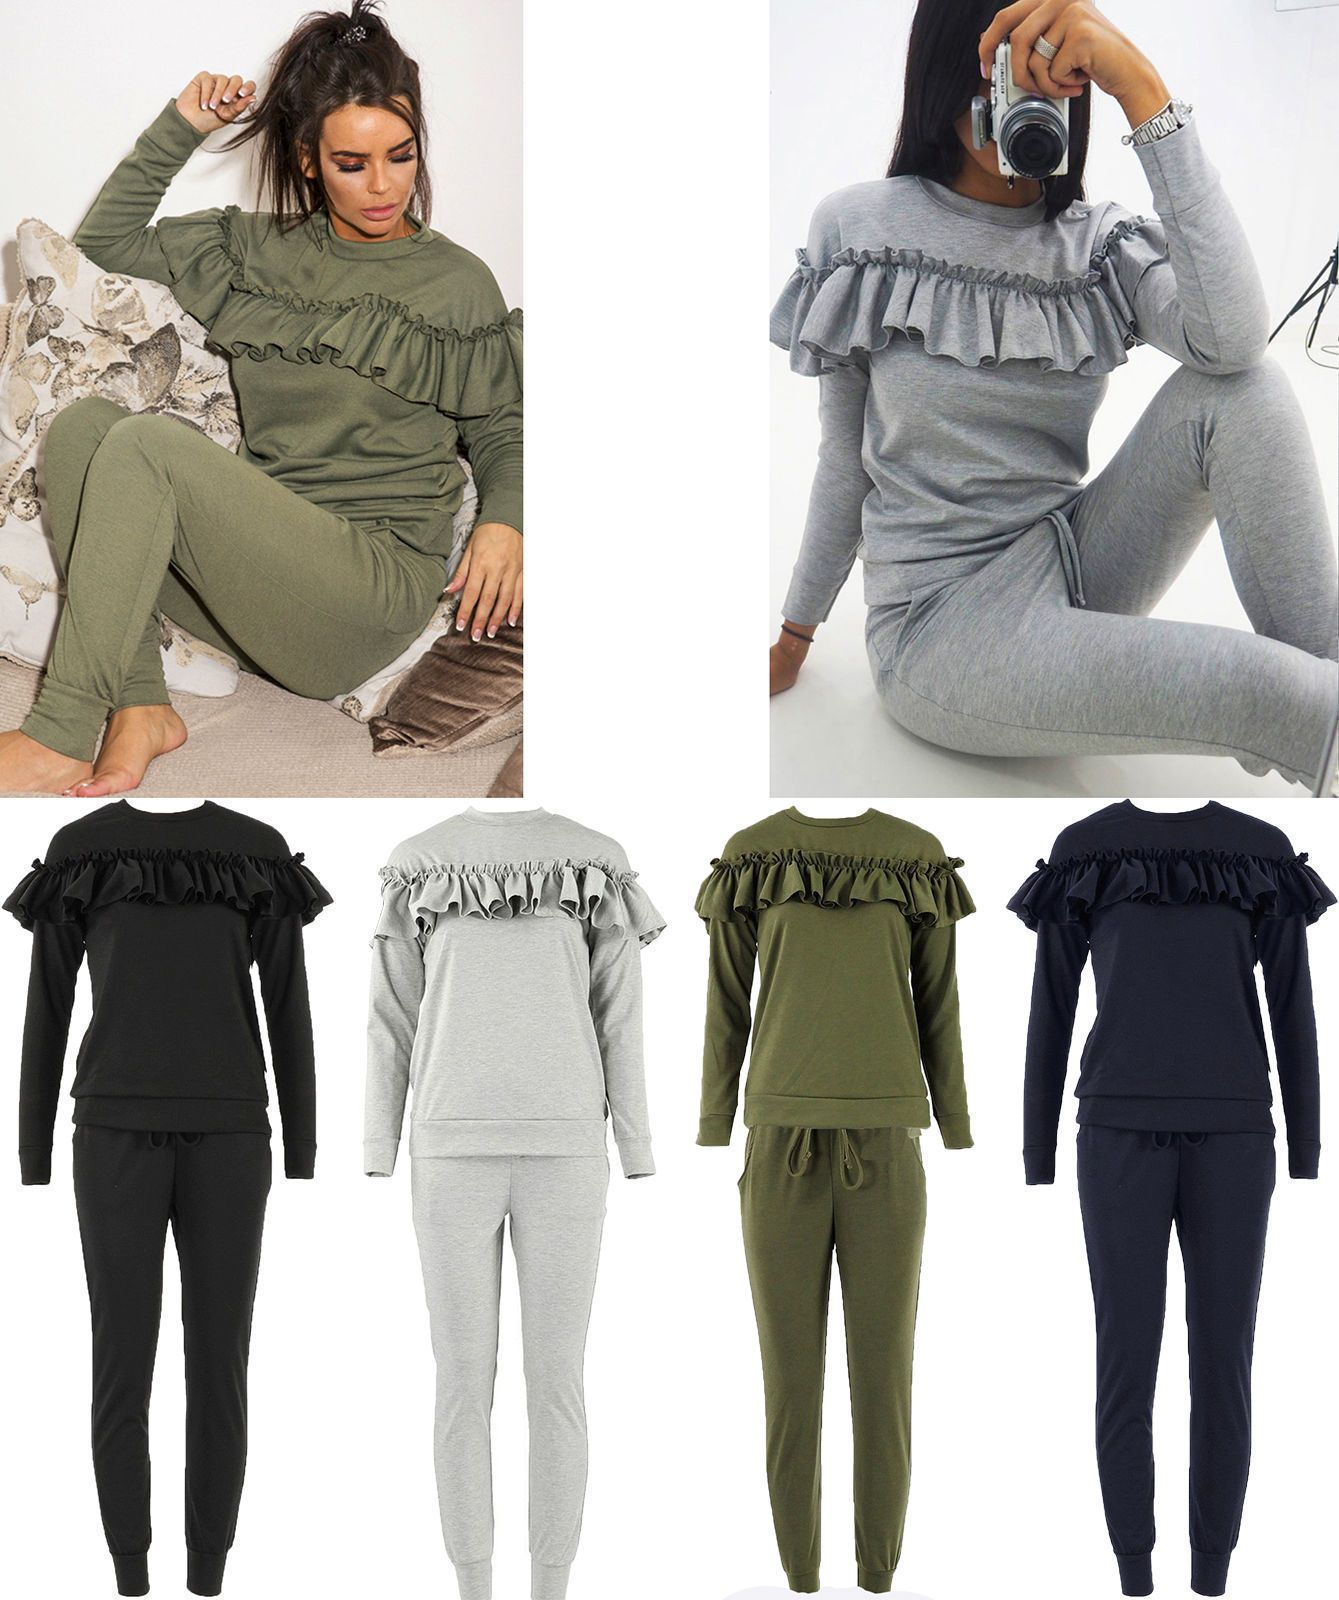 Femme mesdames ruffle frill detail top /& bottom jogger lounge wear set survêtement